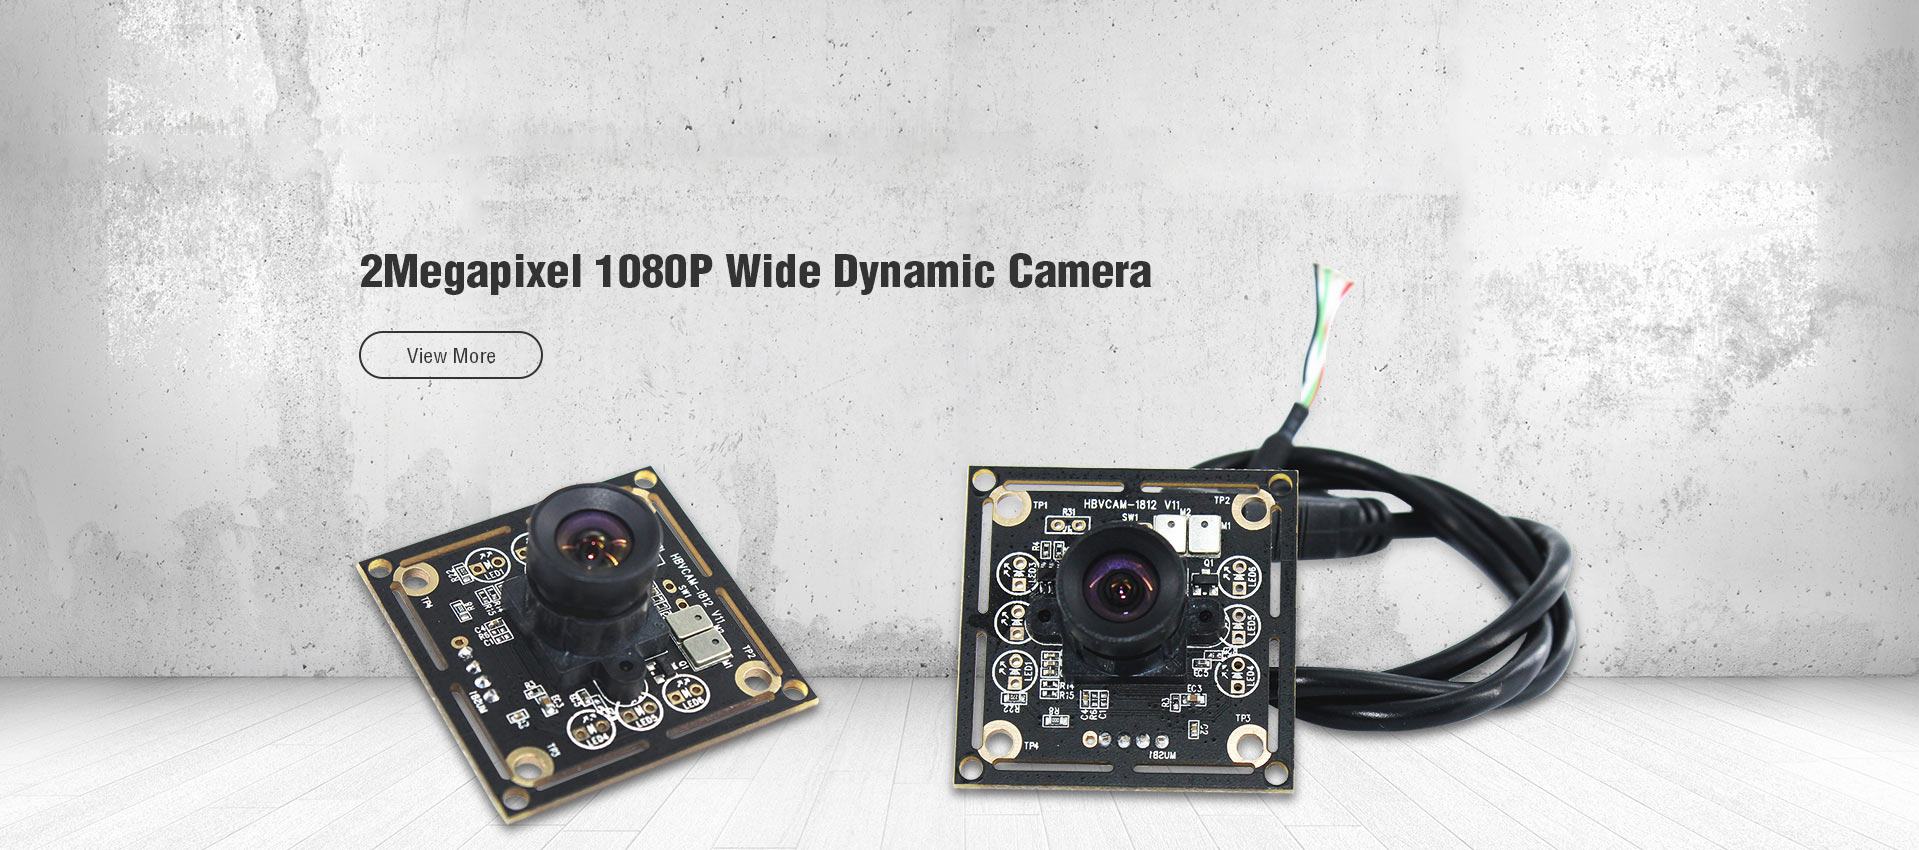 2Megapixel 1080P Wide Dynamic Camera